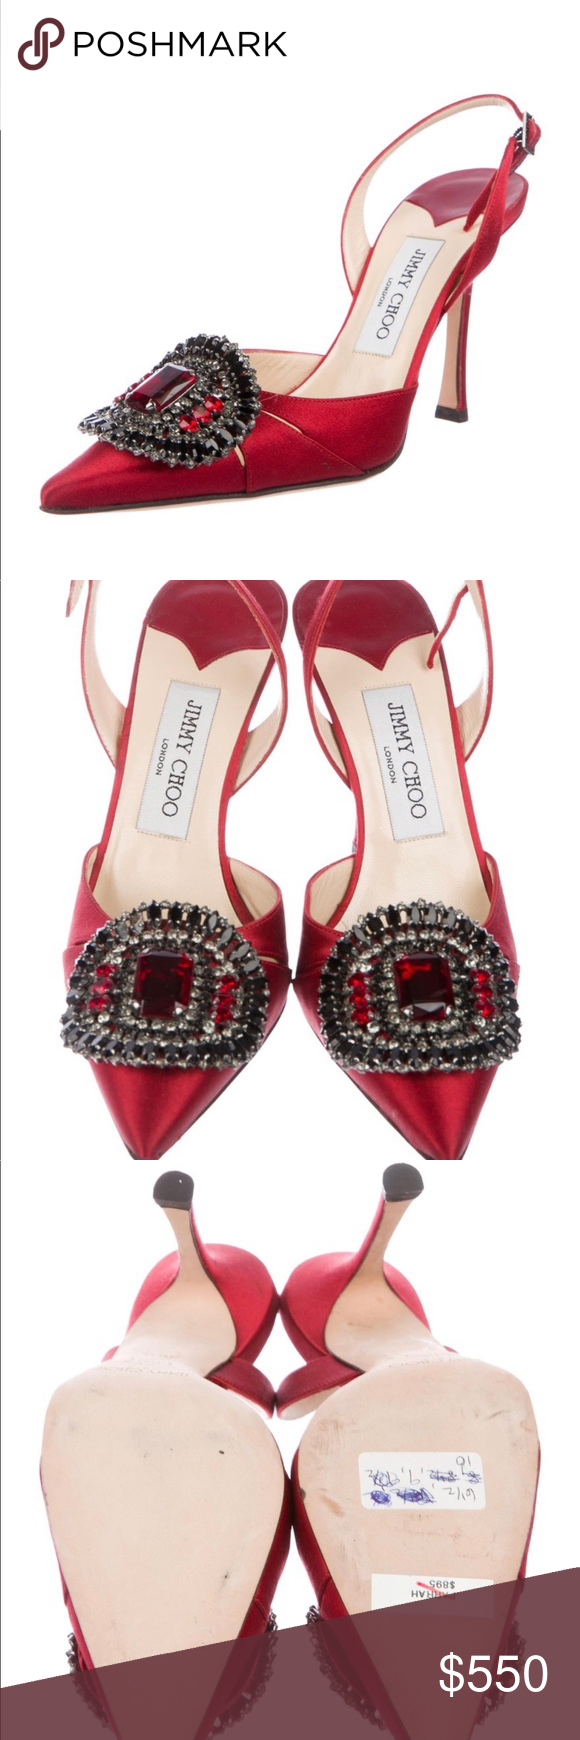 Jimmy Choo Slingback heels Satin red